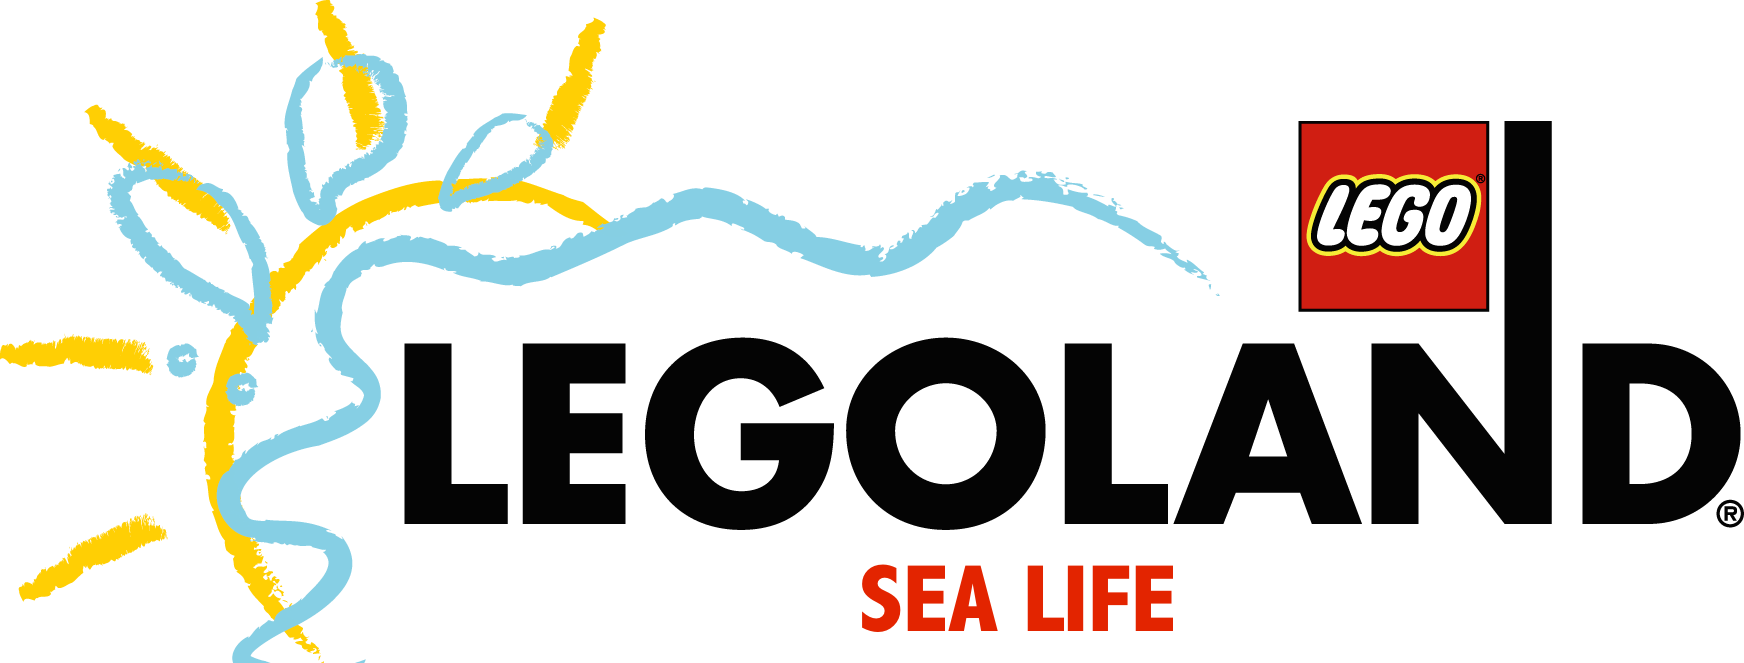 Legoland Sea Life 1-Day Entrance Ticket